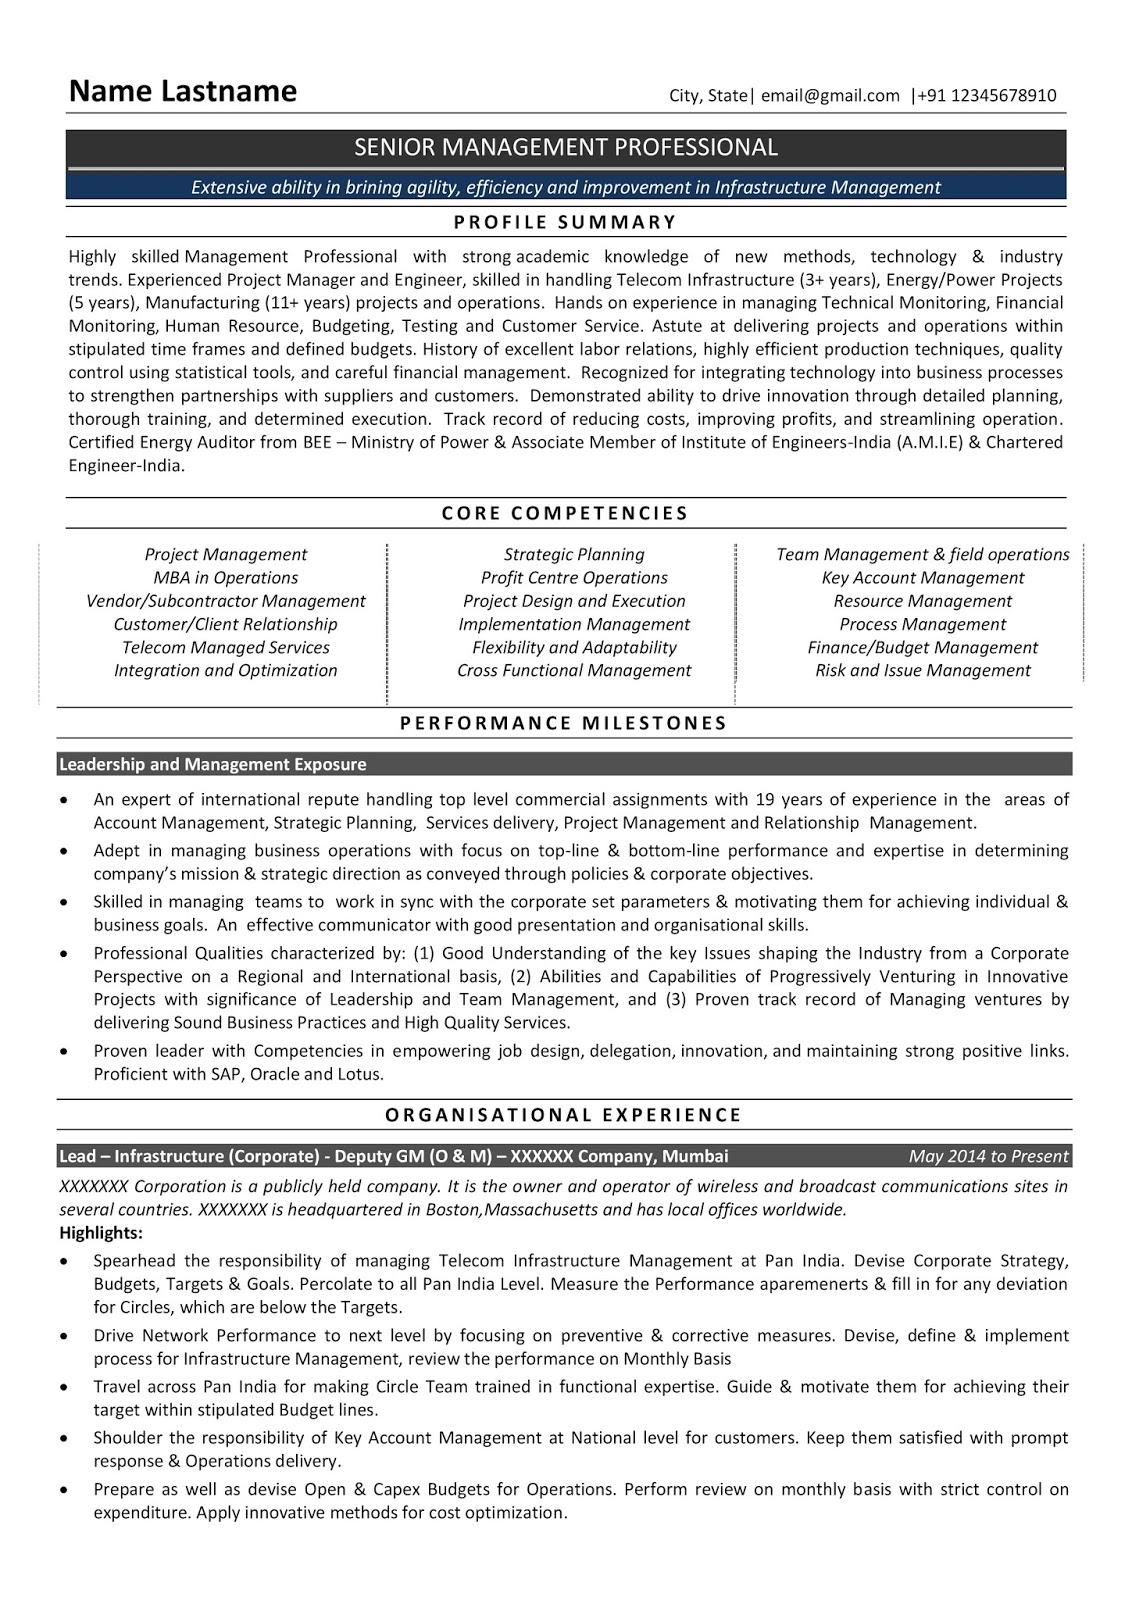 Resume Formats Resume Format Infrastructure Manager Senior